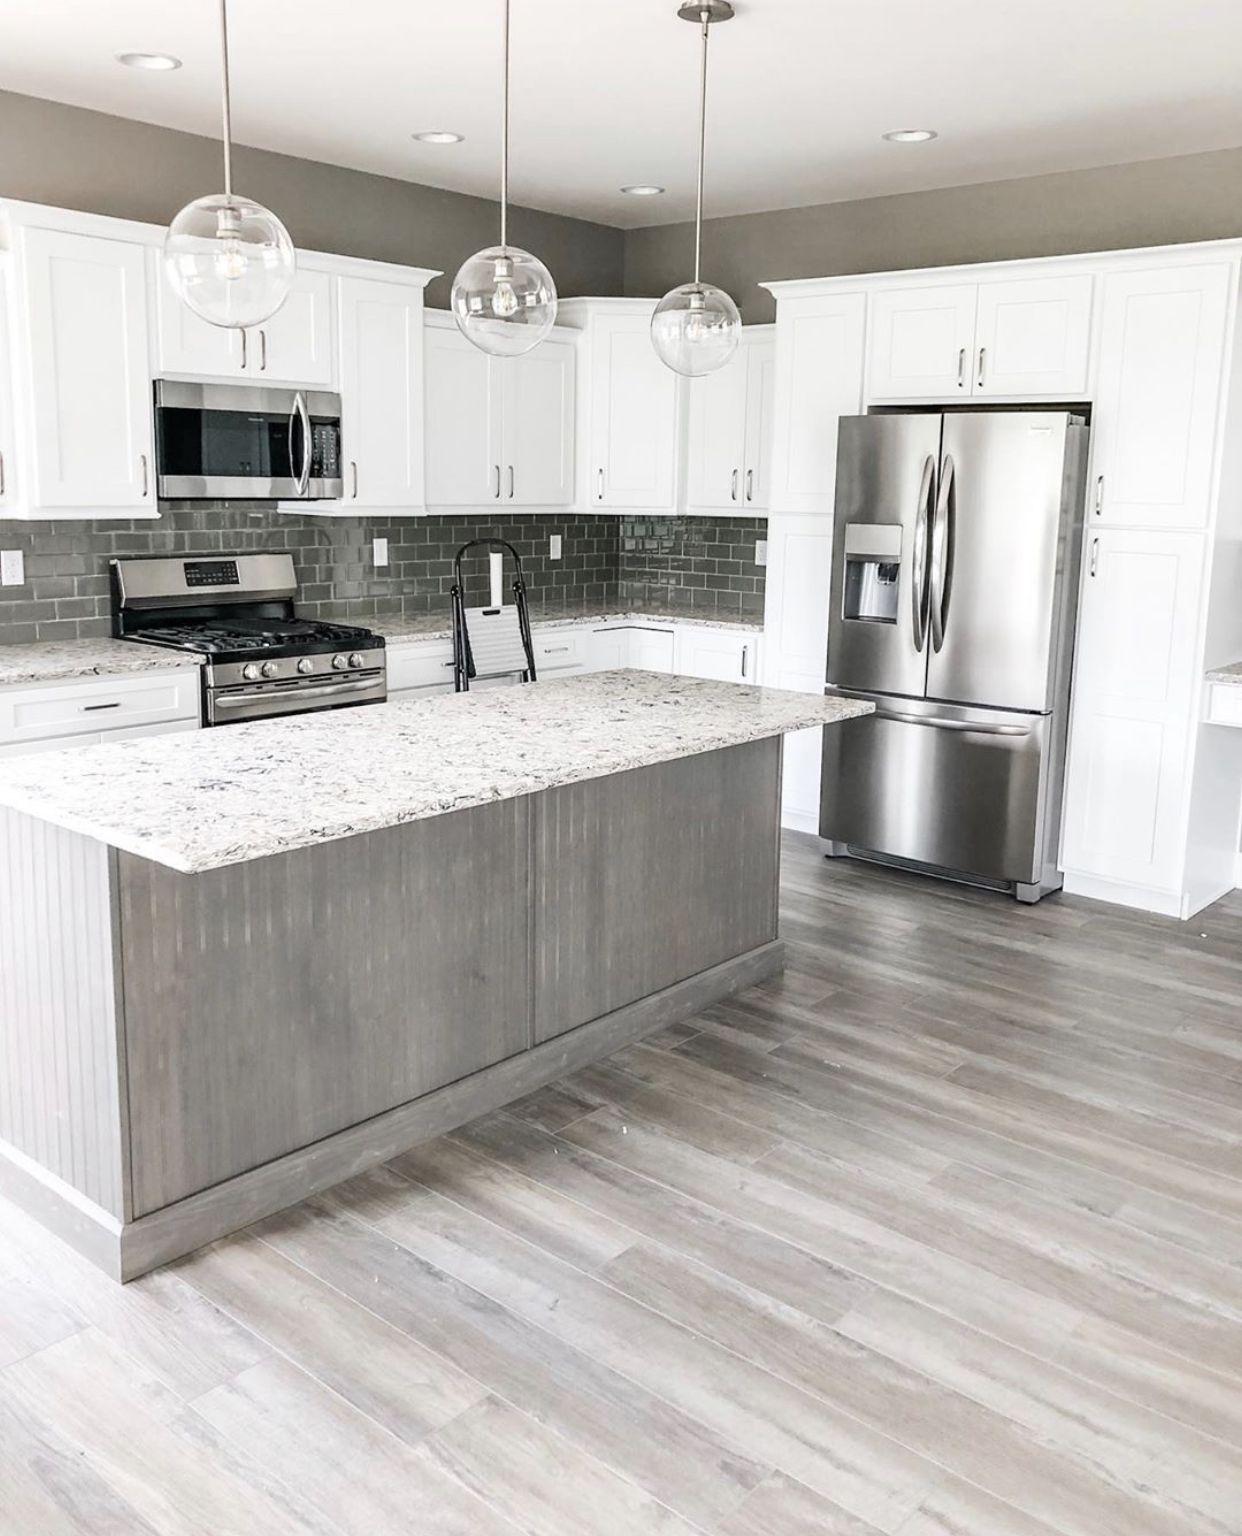 modern kitchen luxury vinyl plank flooring and glass subway tiled backsplash vinyl plank on kitchen remodel vinyl flooring id=17730